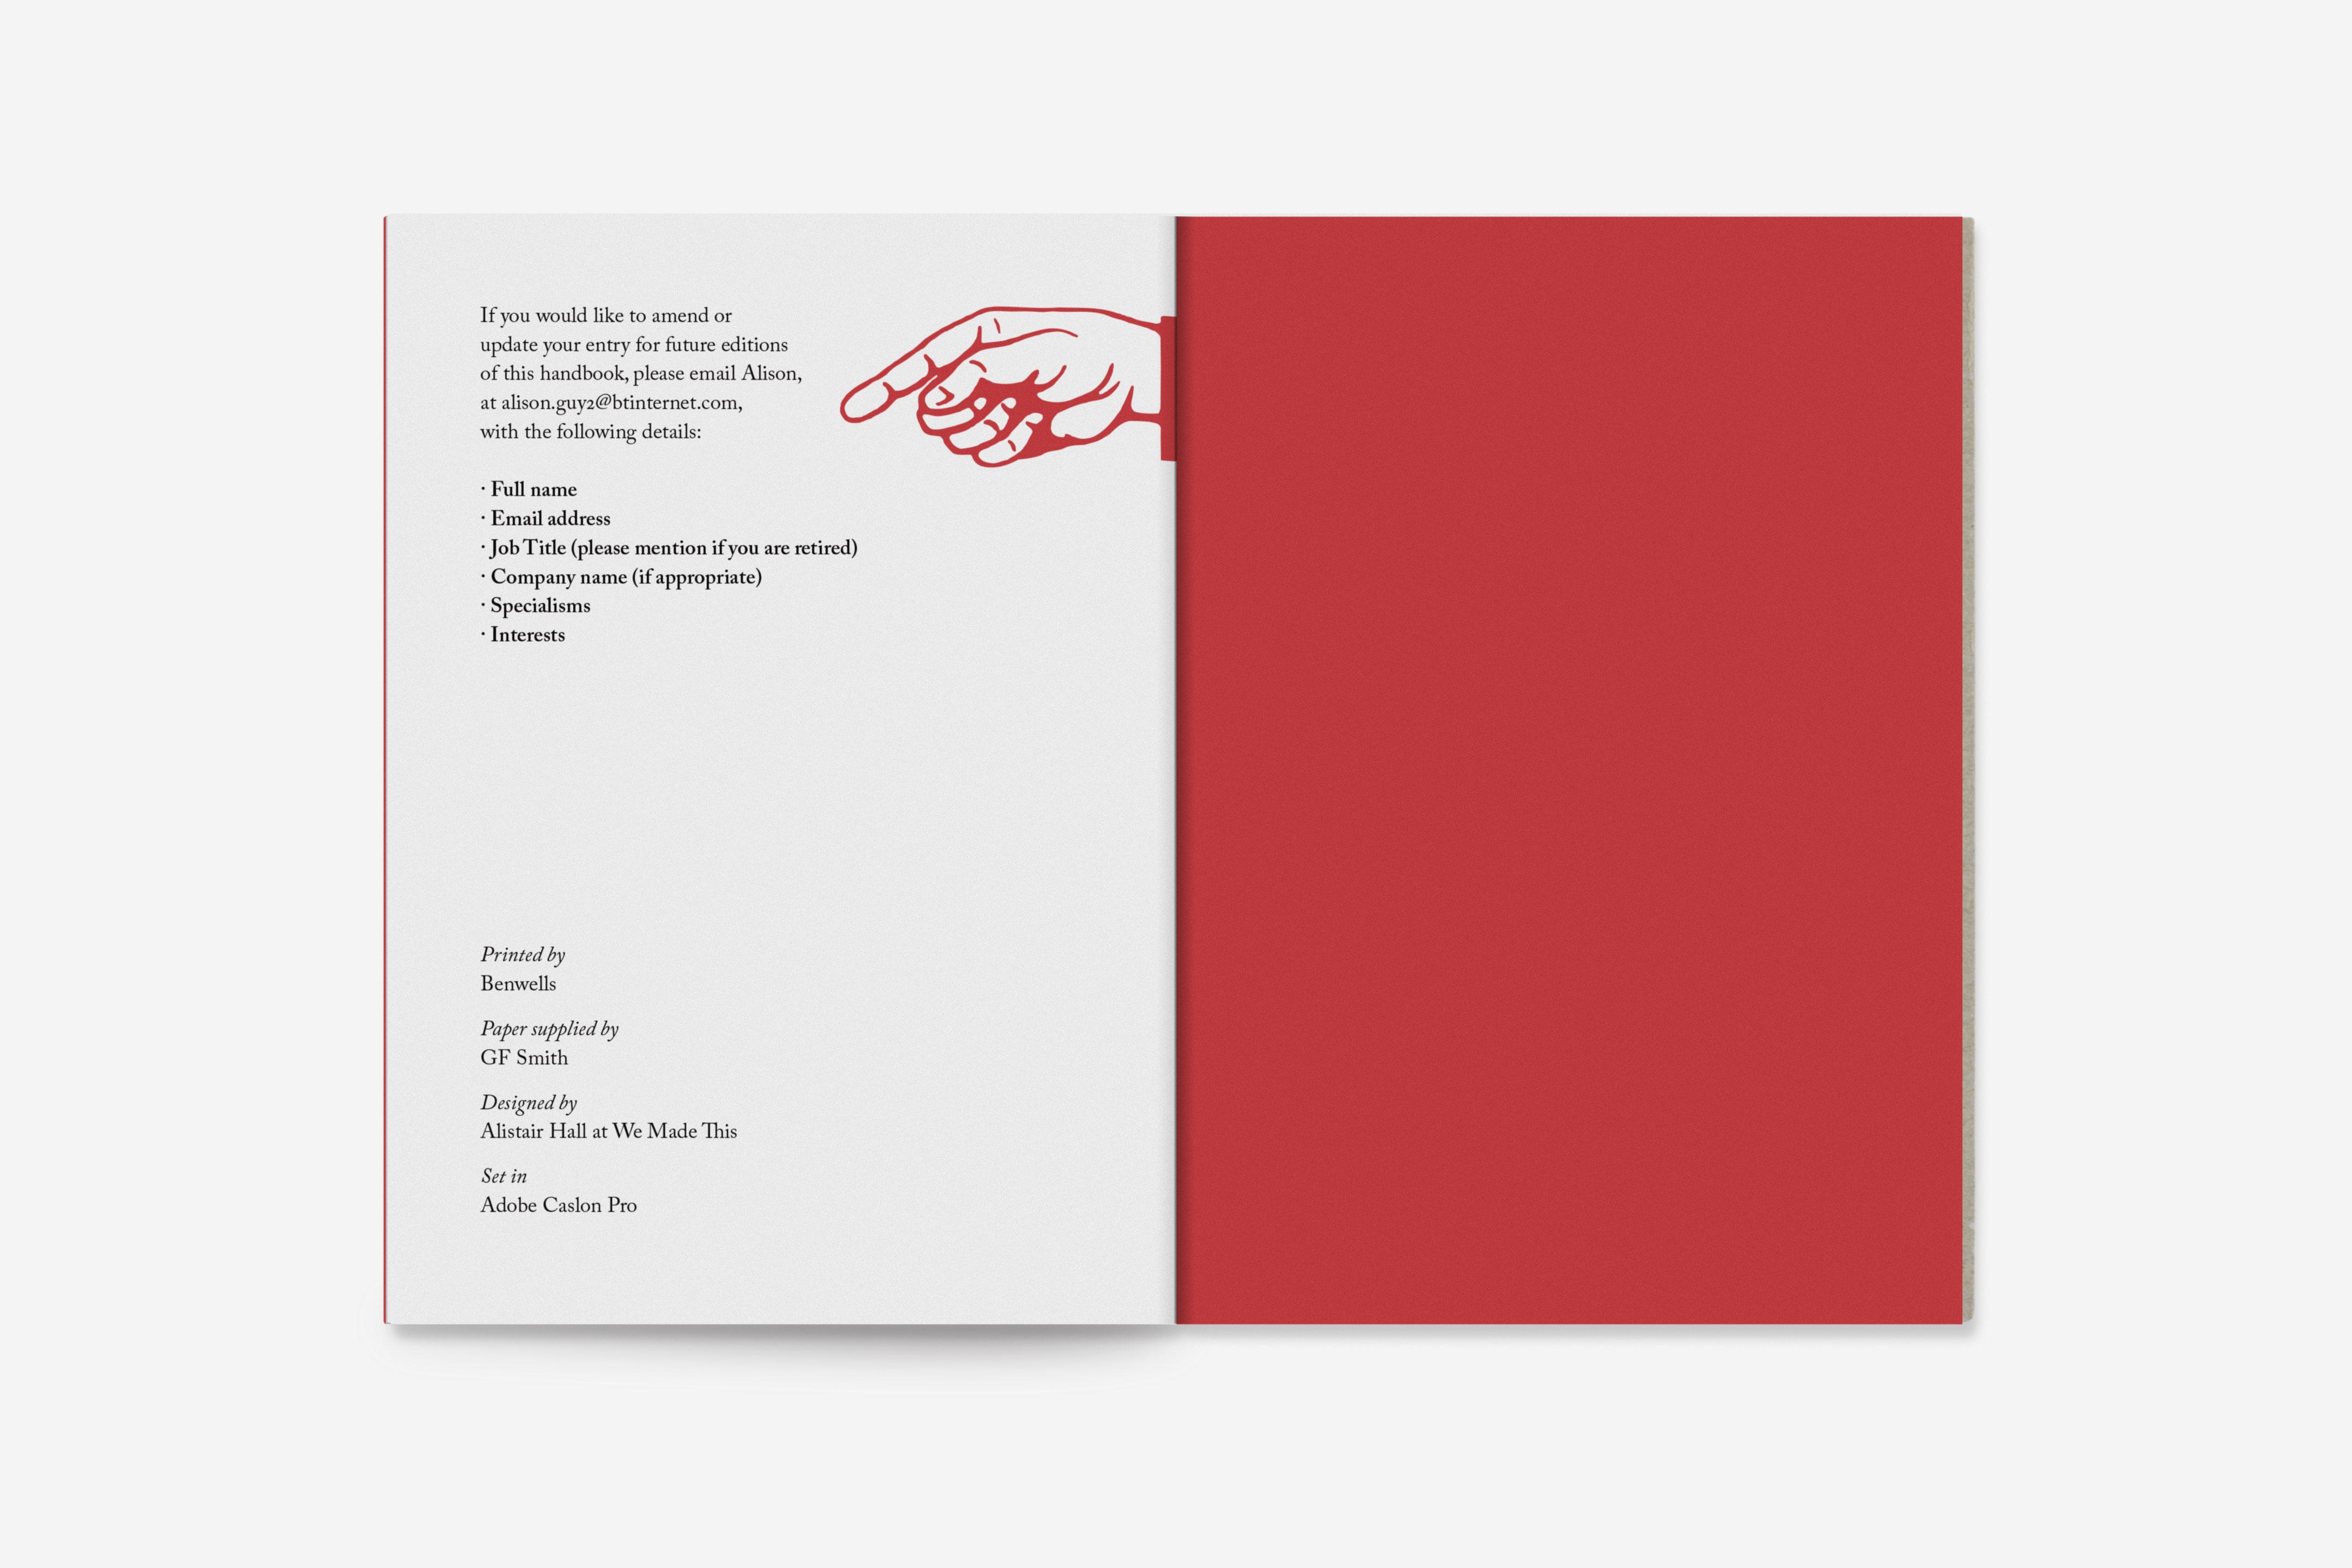 WdeW-Members-Booklet-spread6